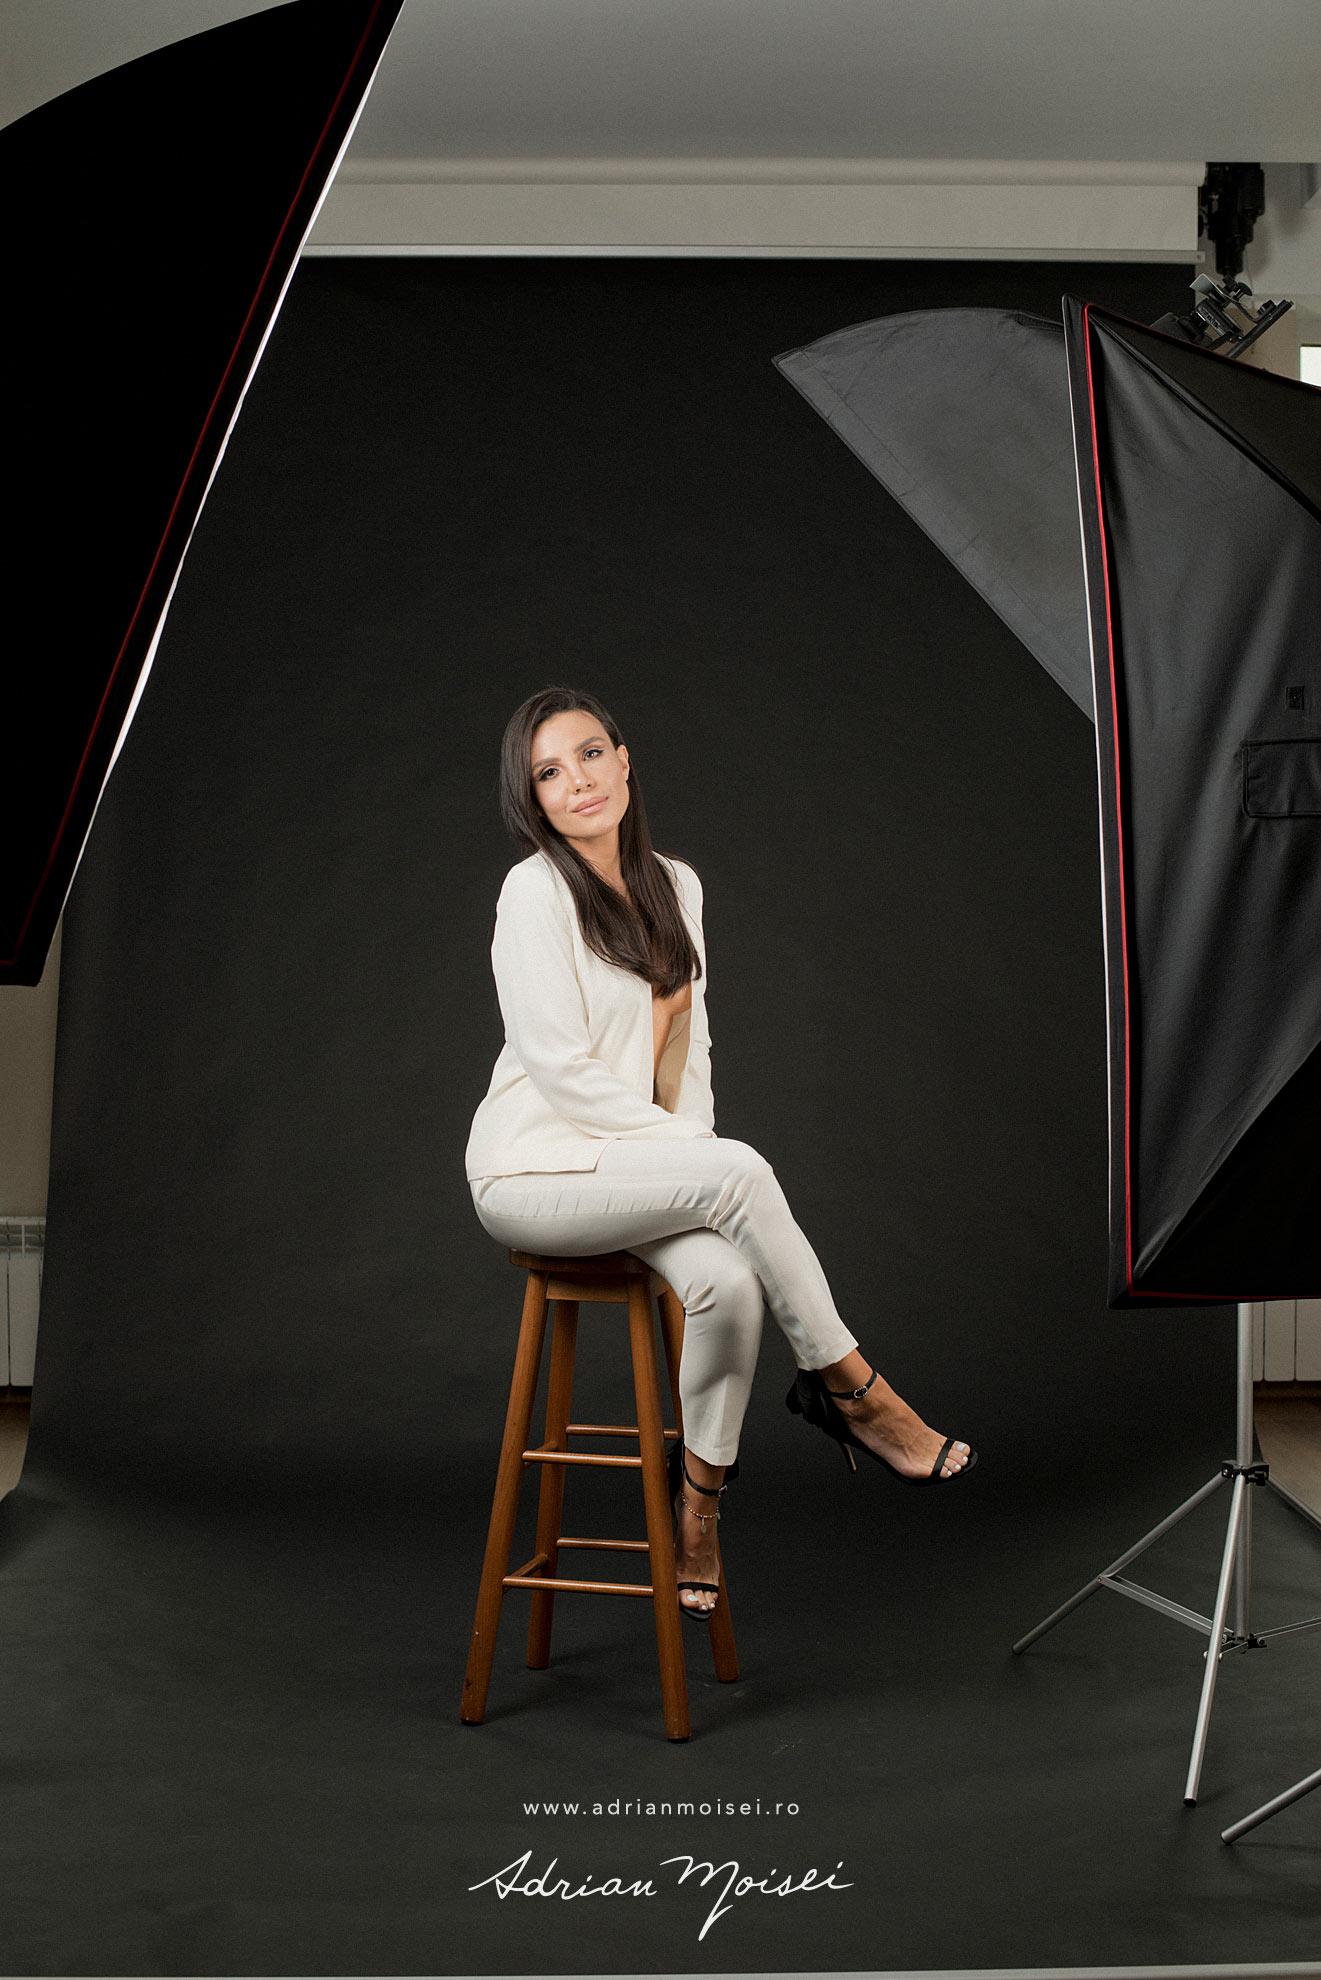 Fotograf fashion Iasi - fotografie cu modela frumoasa si senzuala in studio, pe fundal negru - studio foto